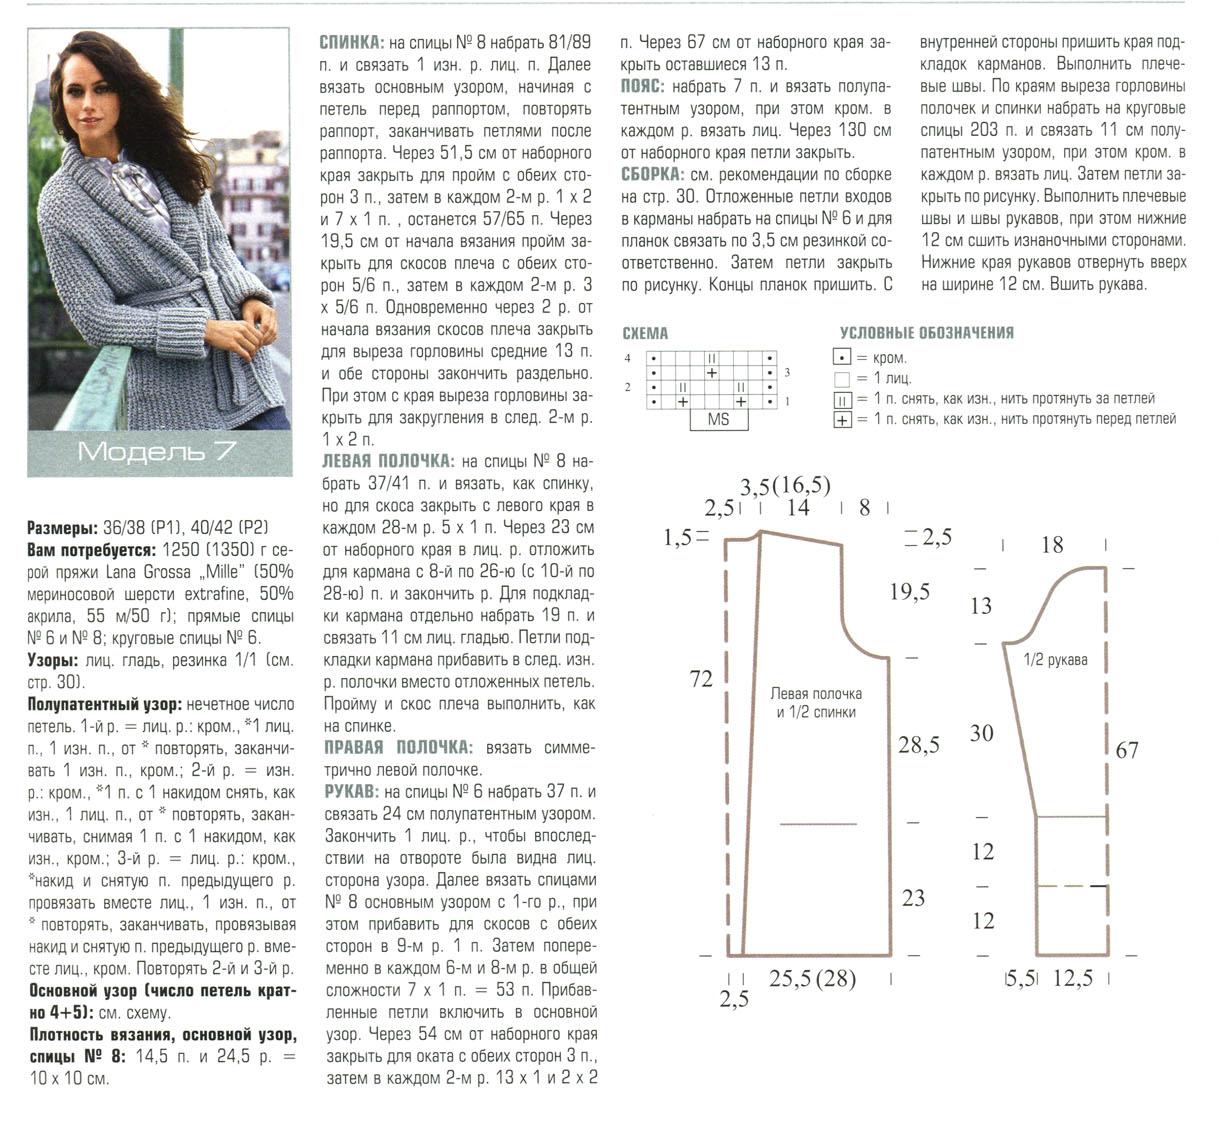 Схема вязания кардигана крупной вязки